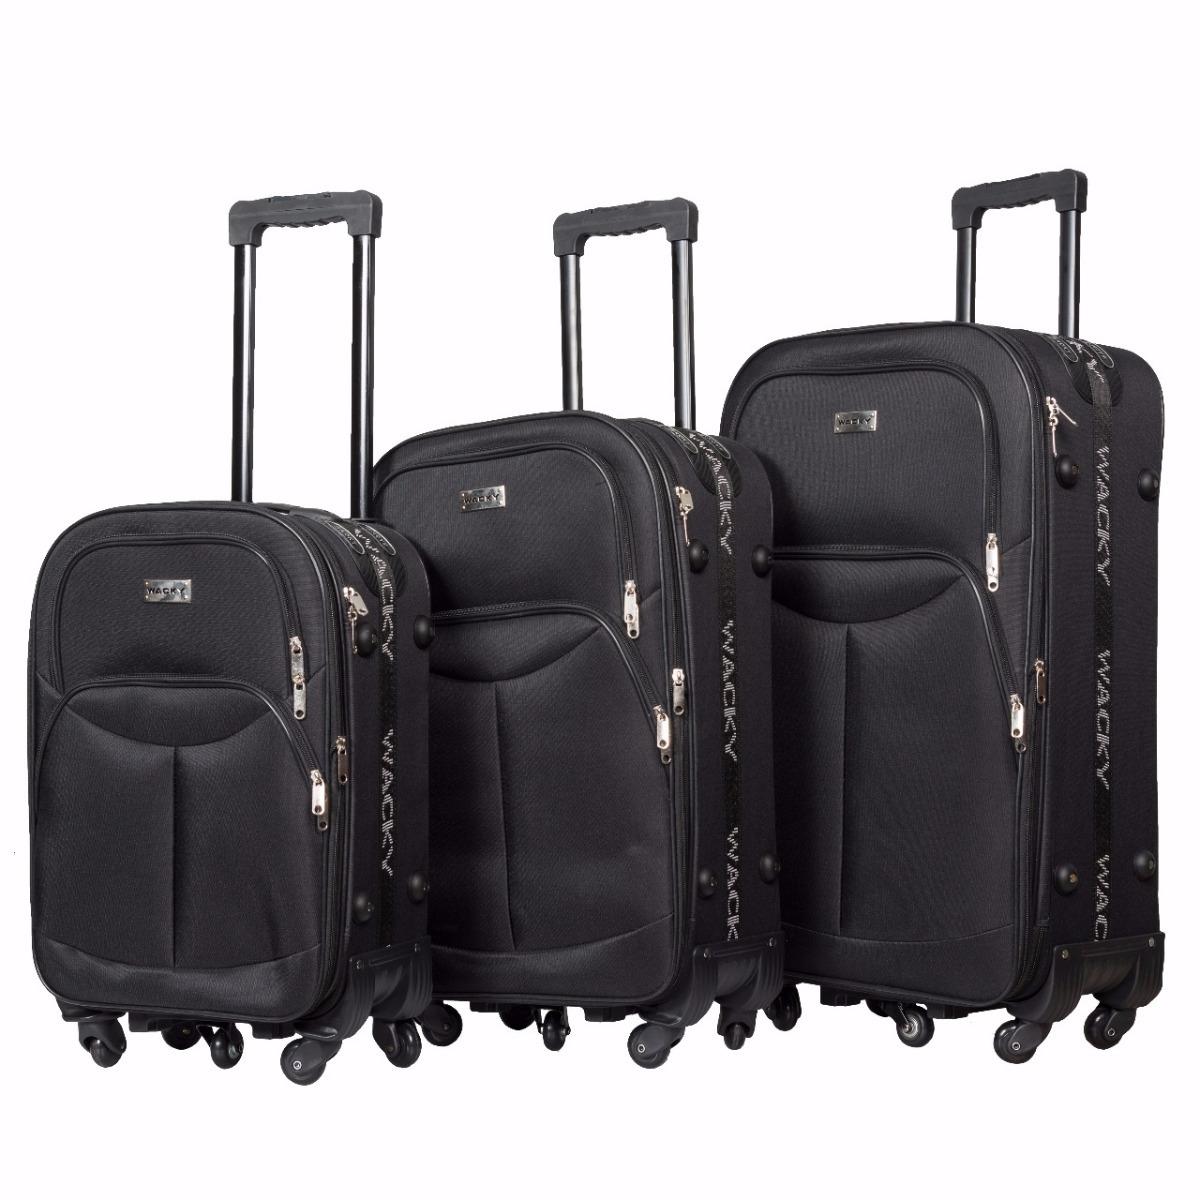 ed6cbf8e4 set de 3 valijas semi rigidas mod502 5 ruedas envio gratis. Cargando zoom.